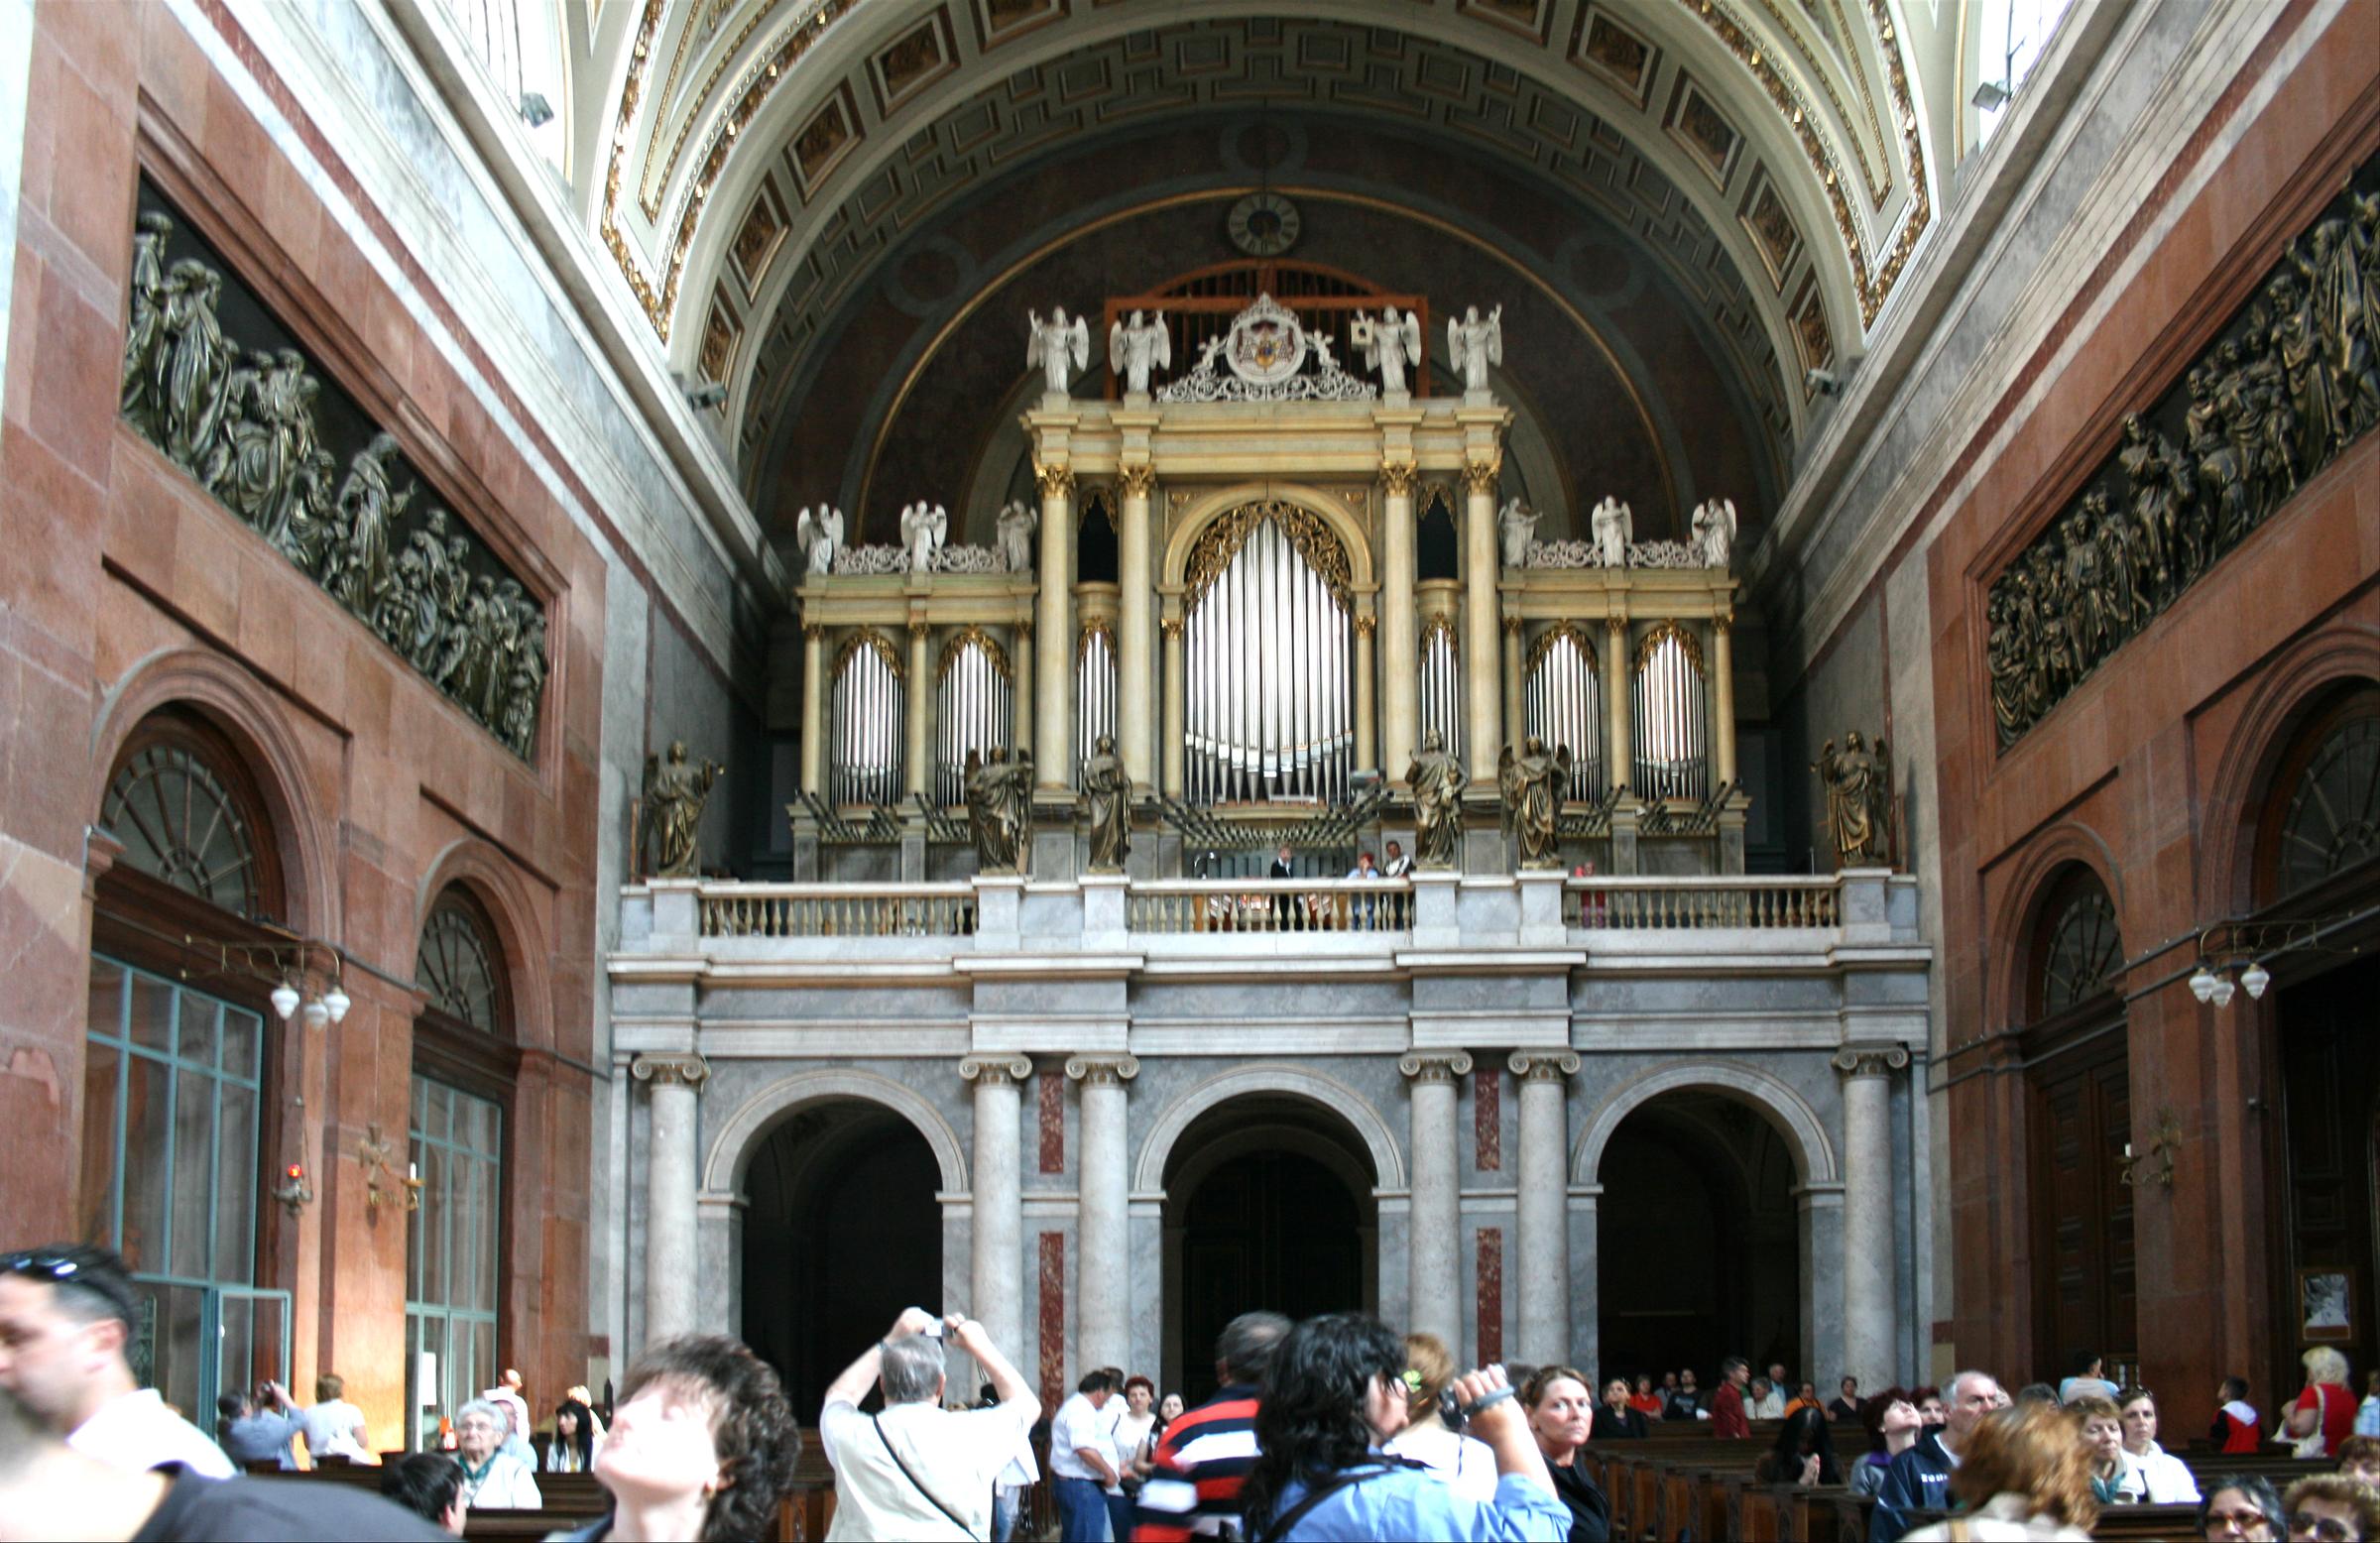 Esztergom_Basilica_interier_5 organ